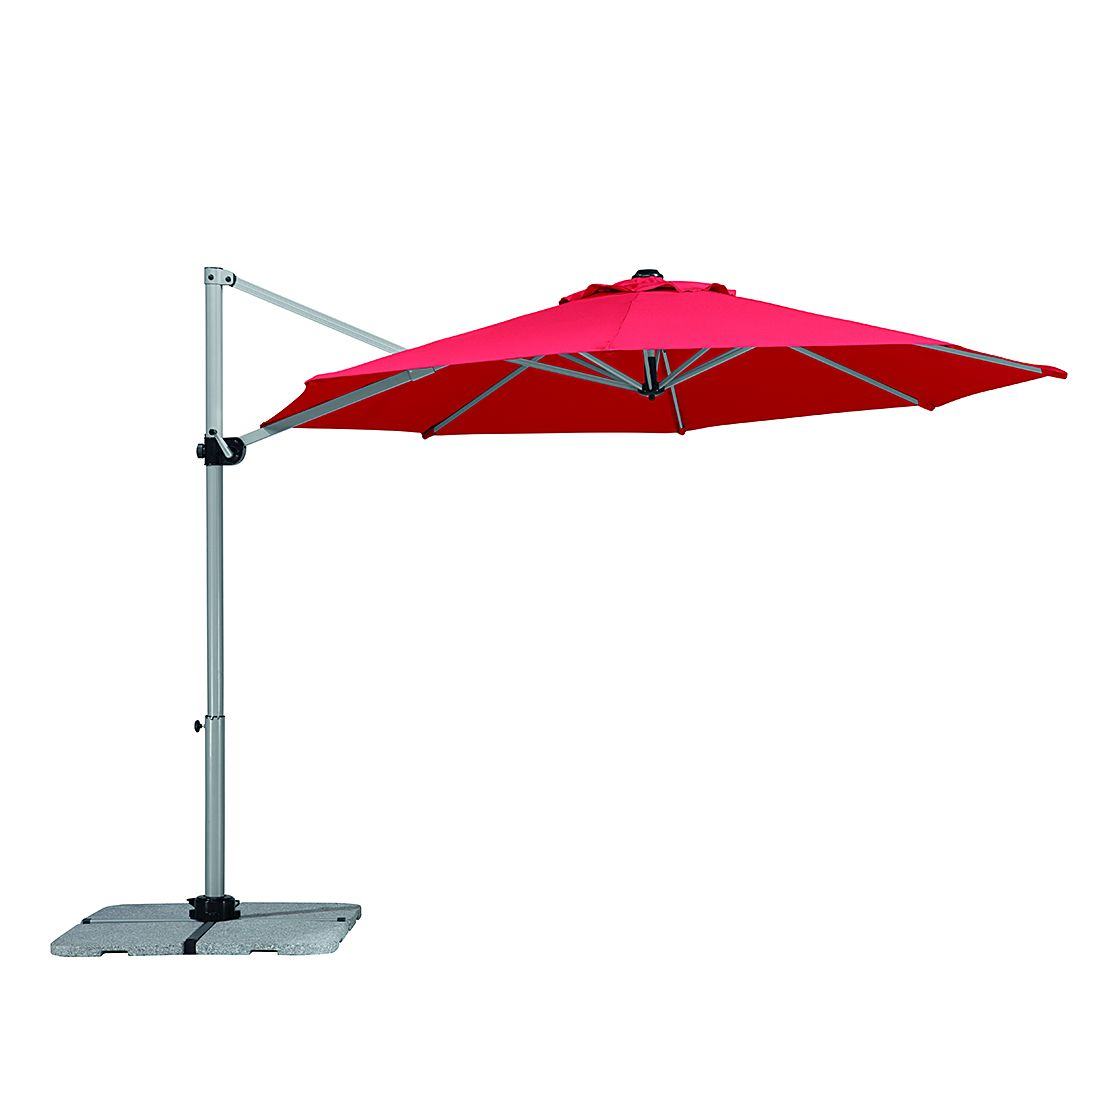 Sonnenschirm Samos 300 - Aluminium/Polyester - Silber/Rot, Schneider Schirme